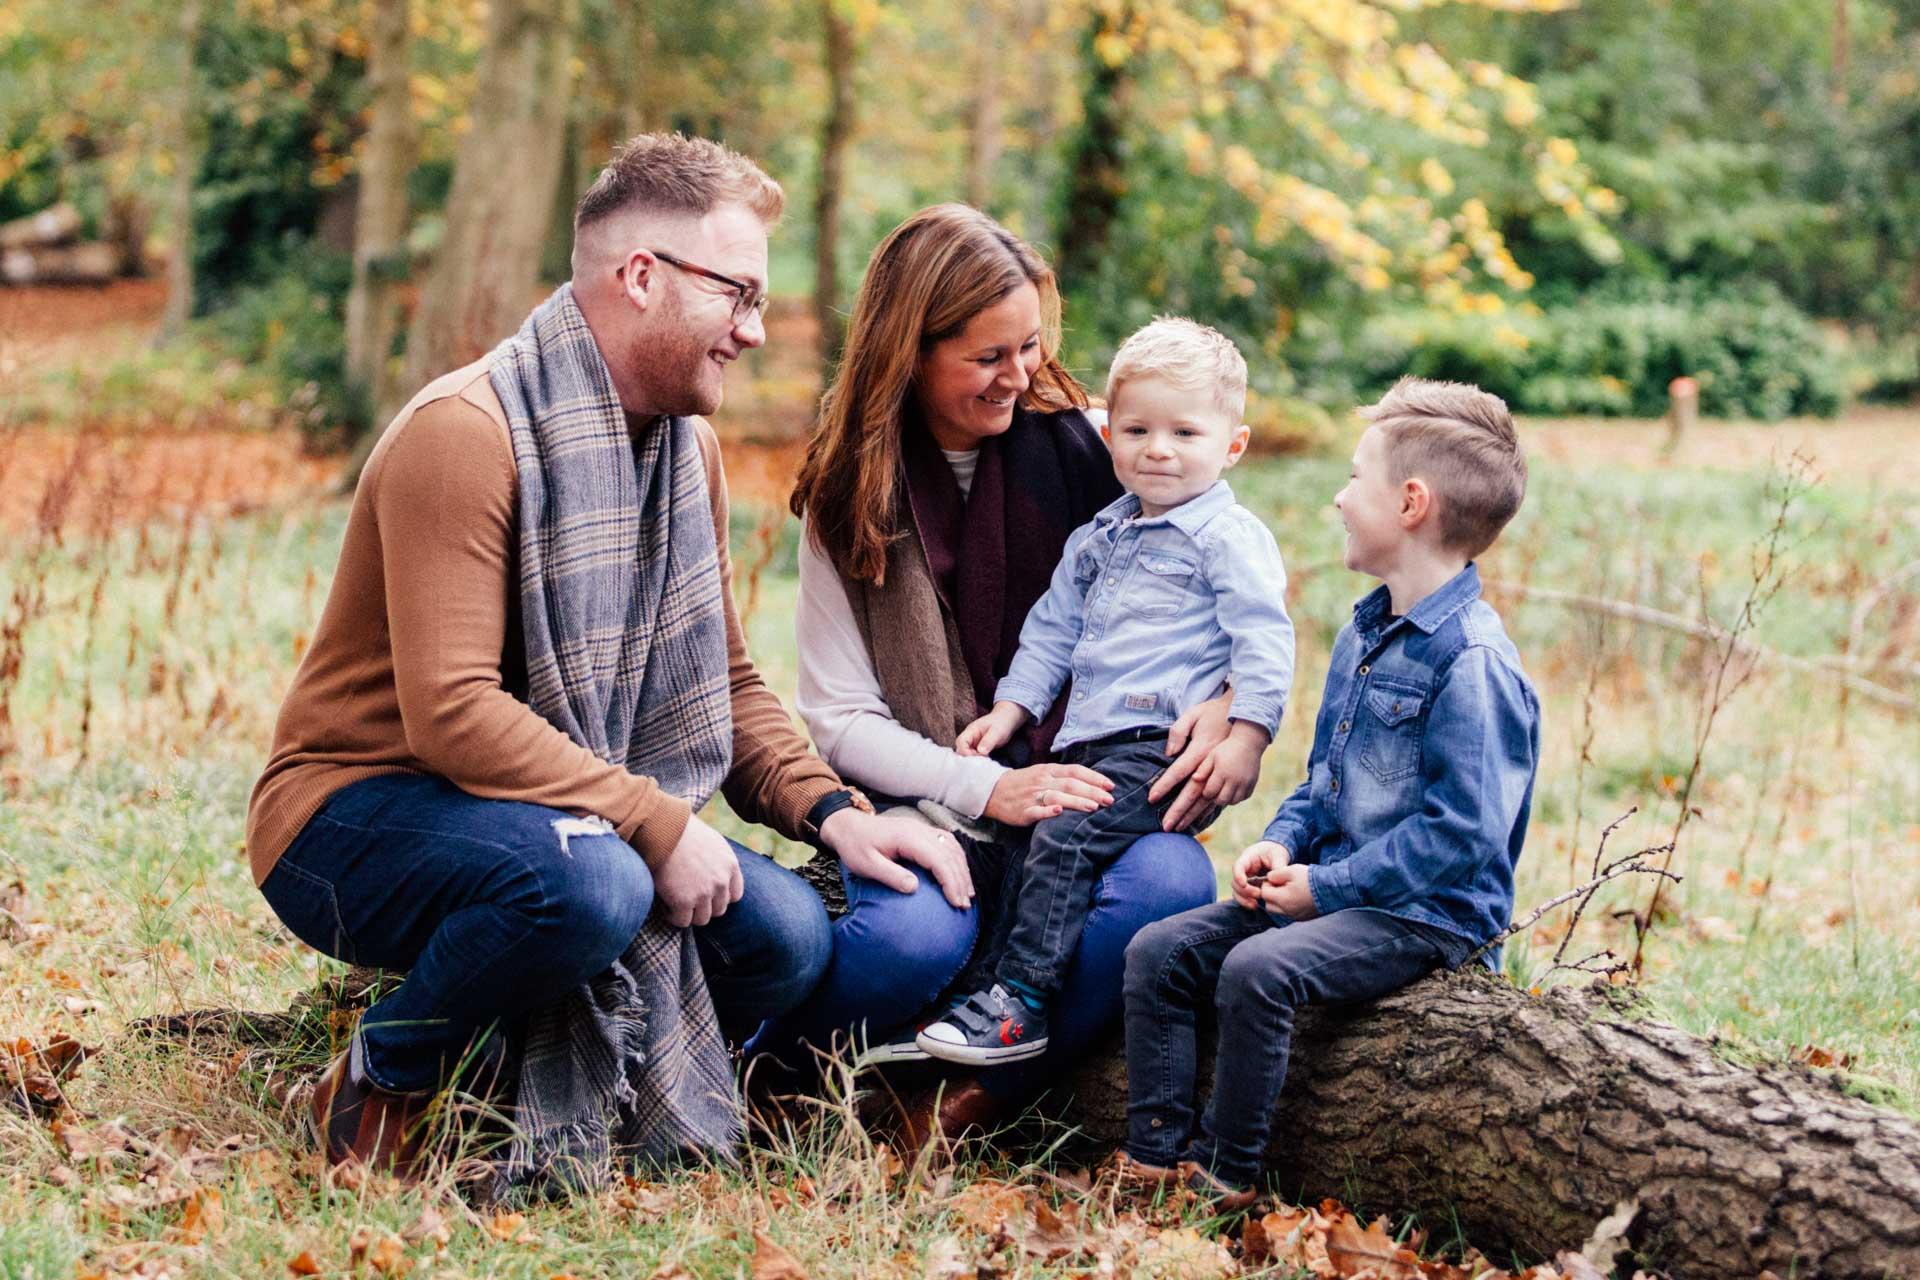 Children Family Photography by Ricky Parker Photography 1